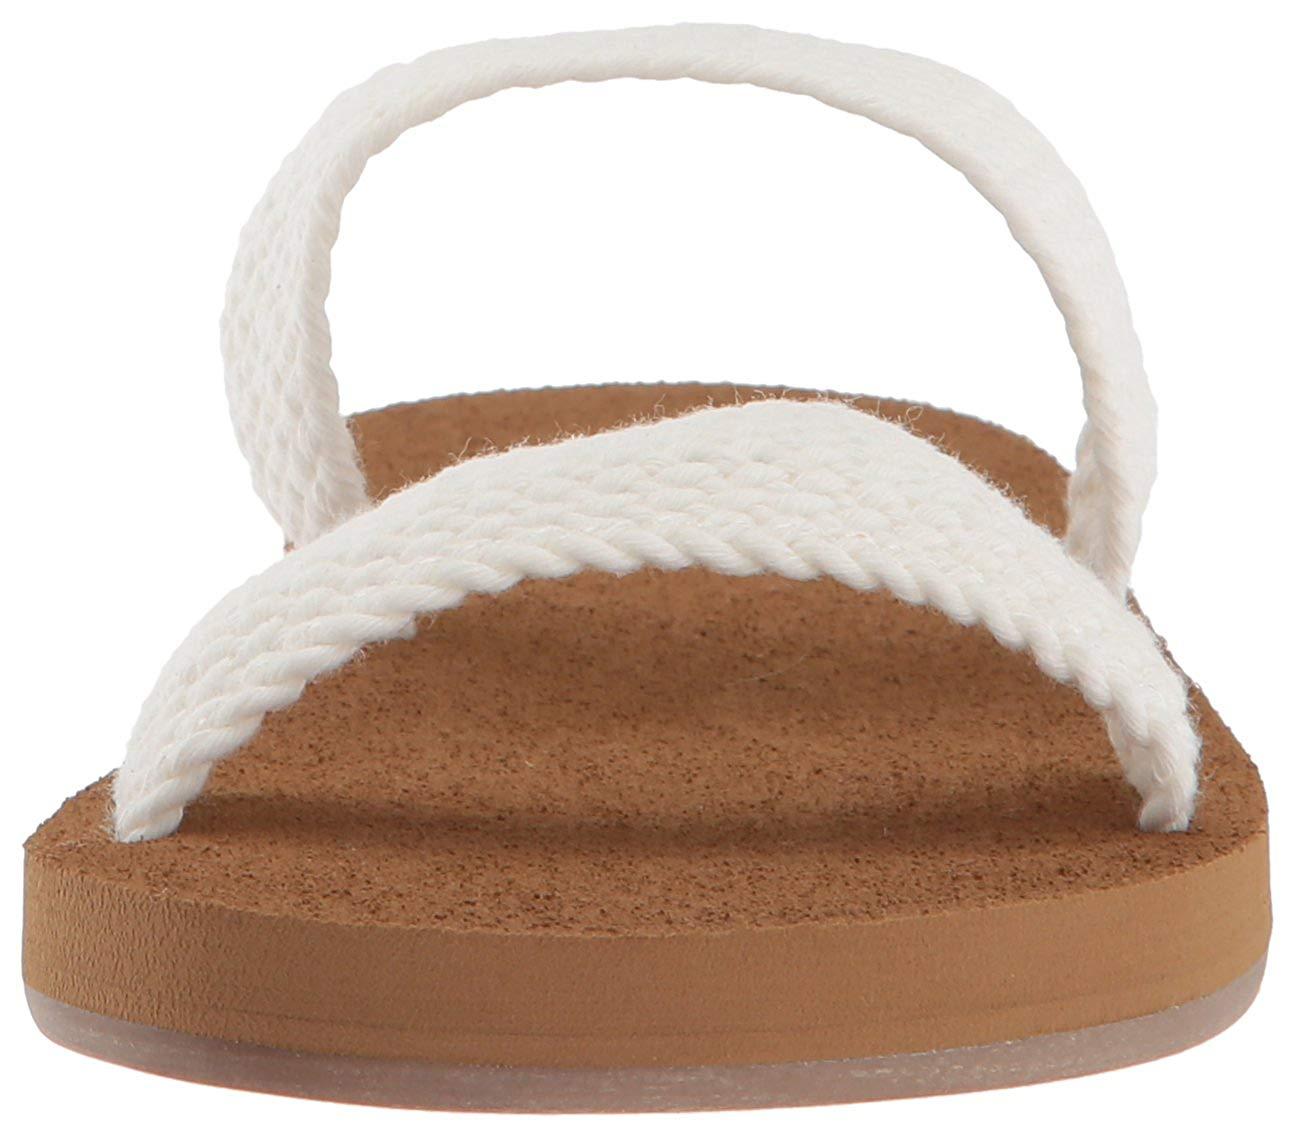 4a93a1639ac10a Details about Roxy Women s Sanibel Slide Sandal